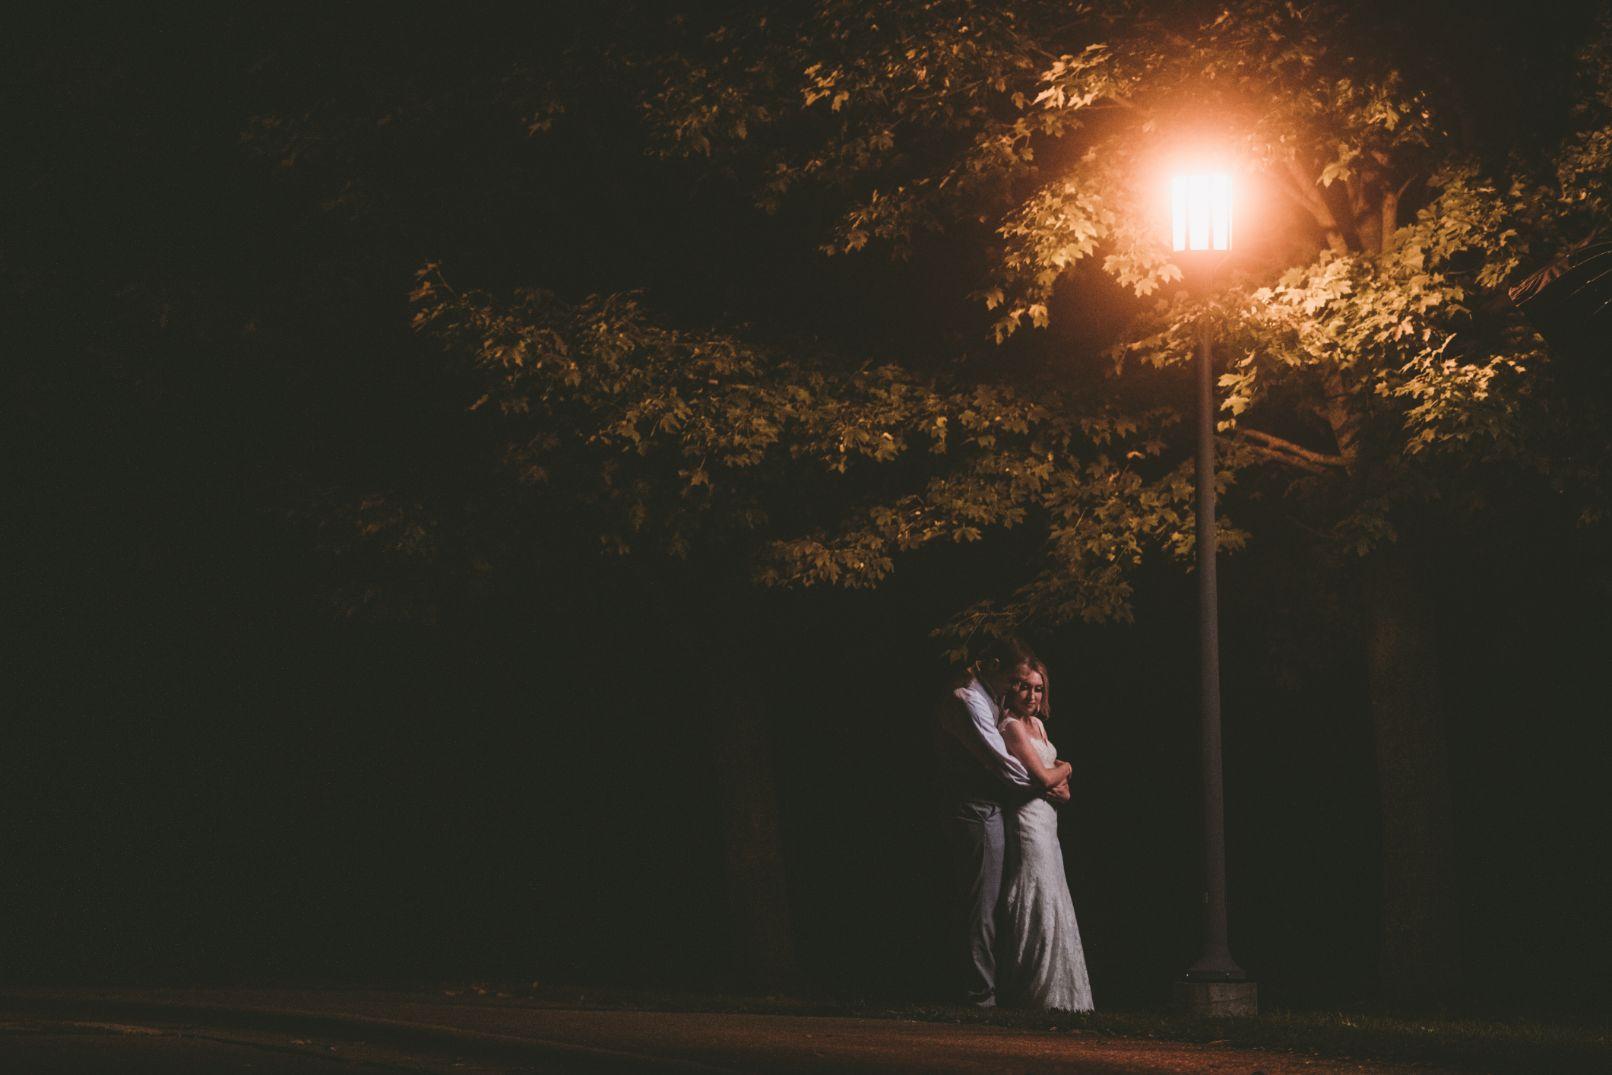 evening romantics under light at Stonebridge Golf Club